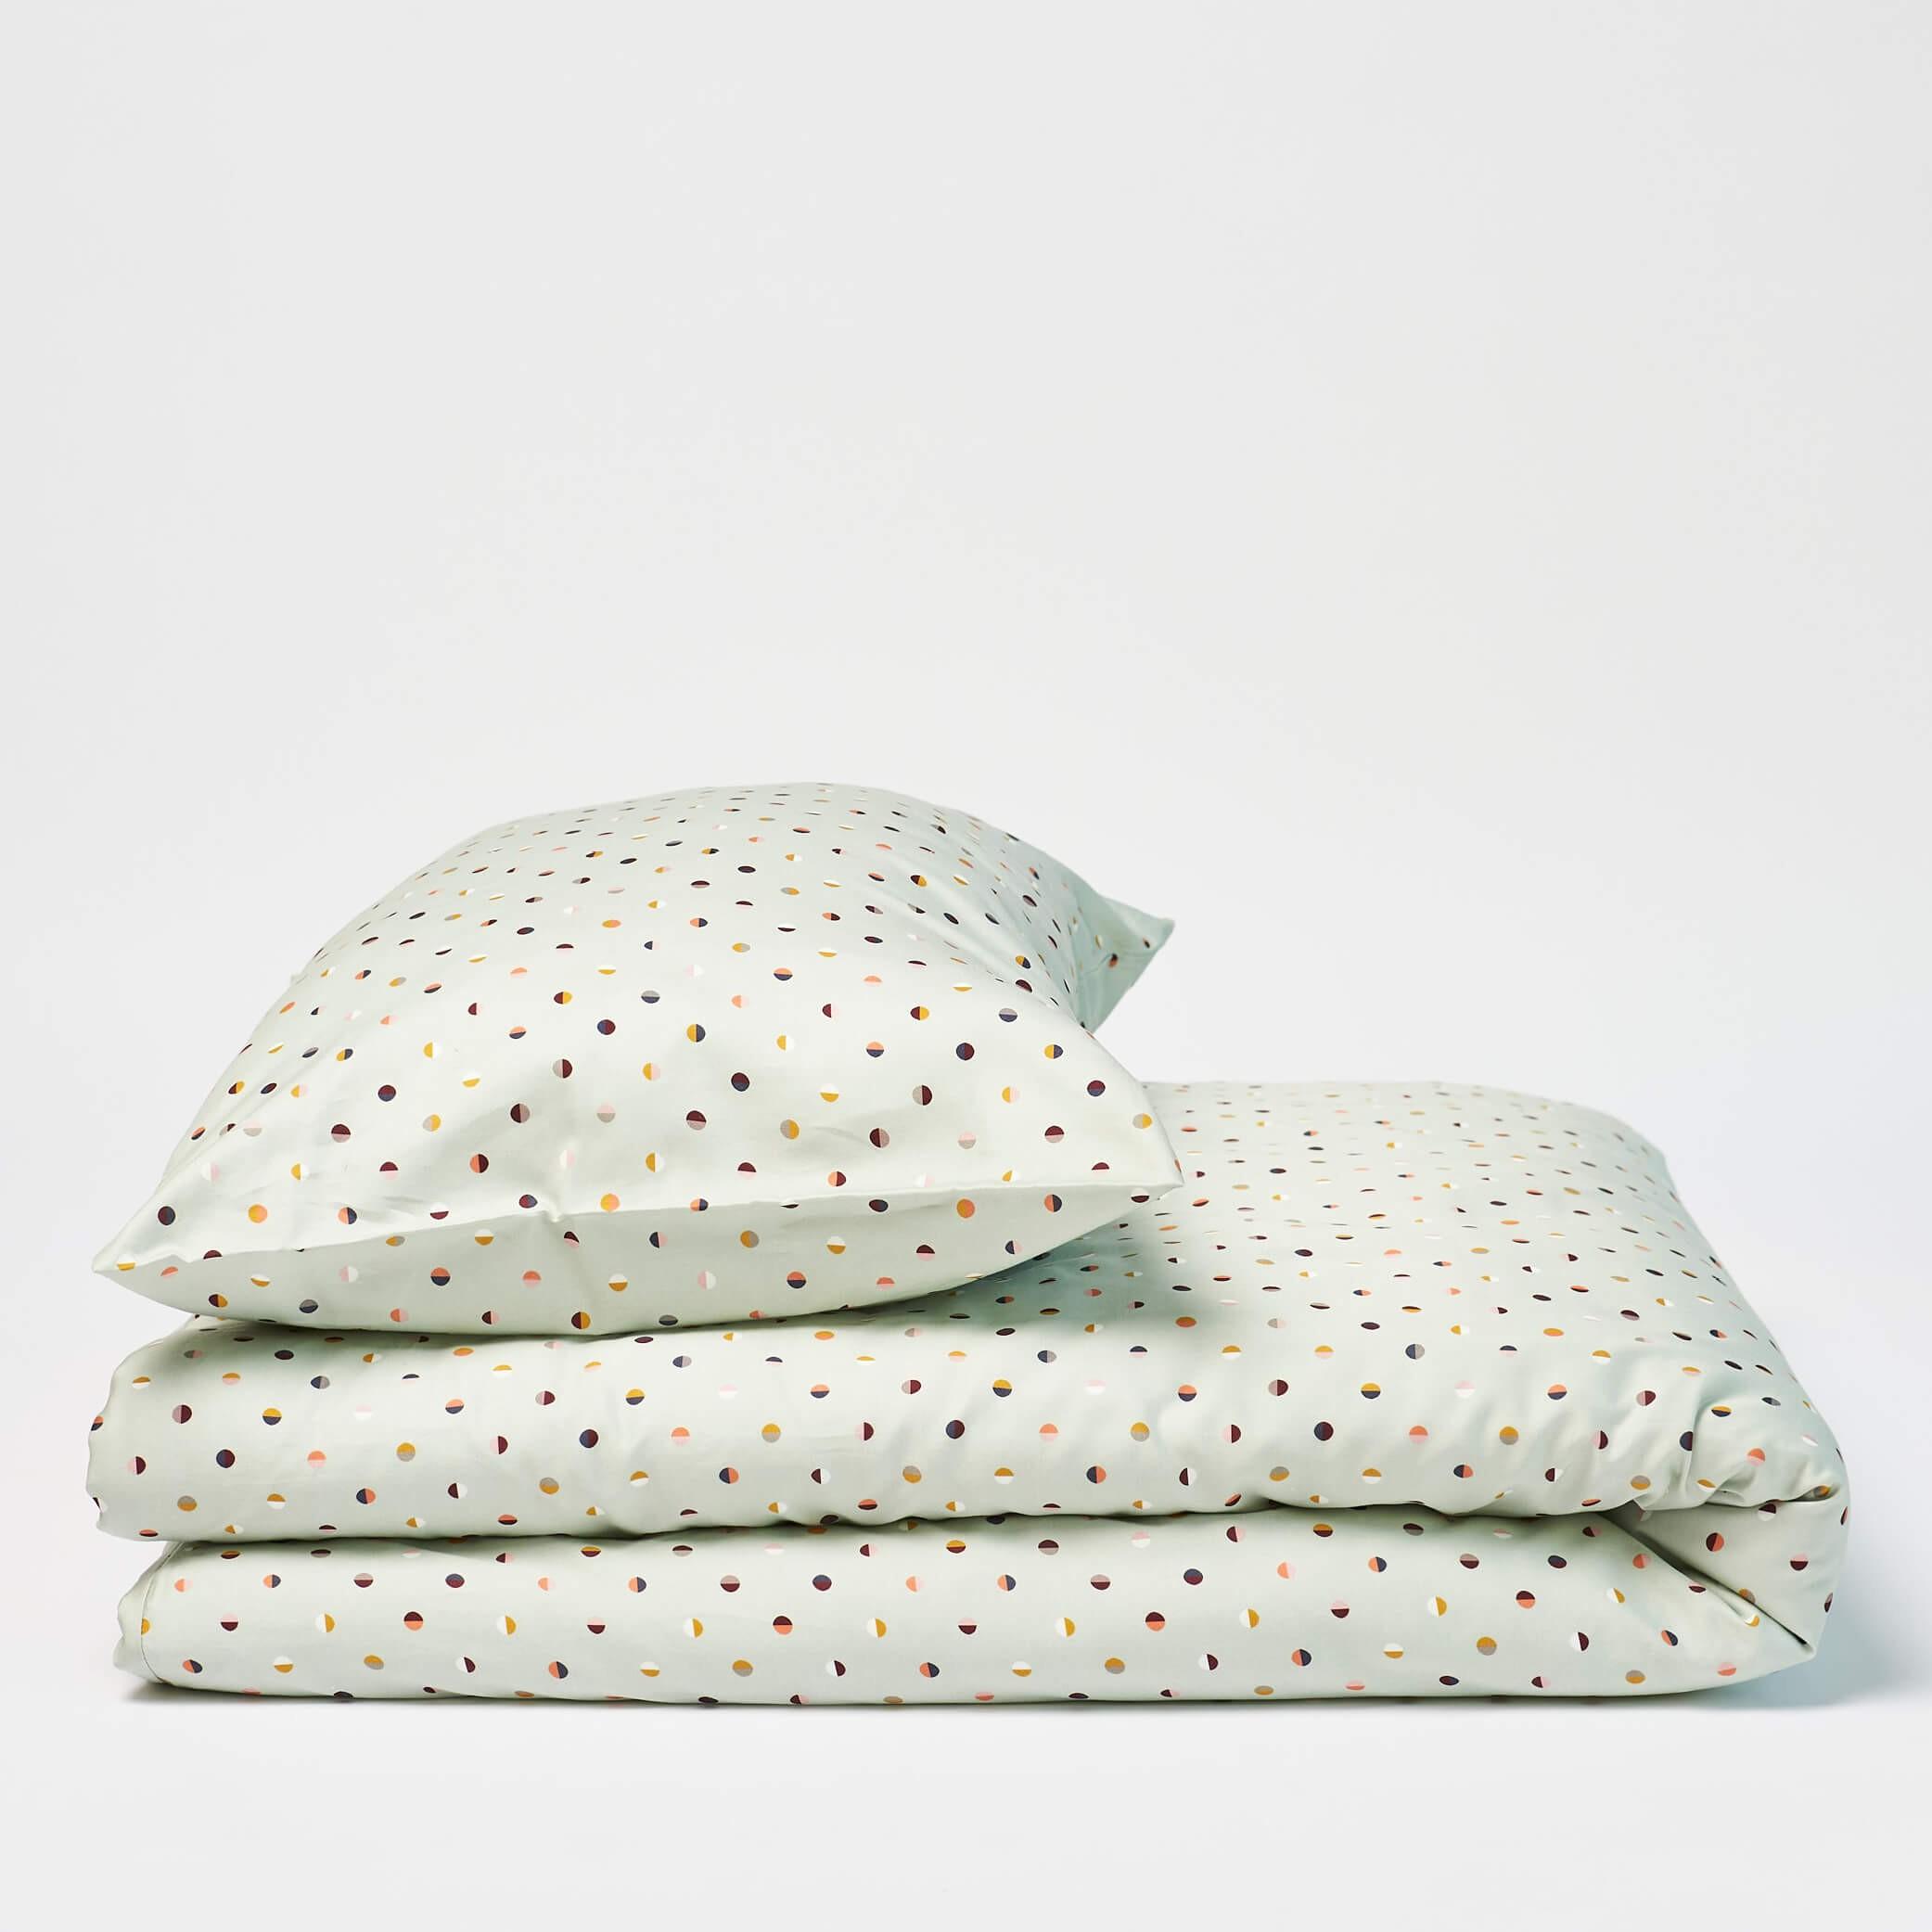 Linge de lit en coton bio SAMSO